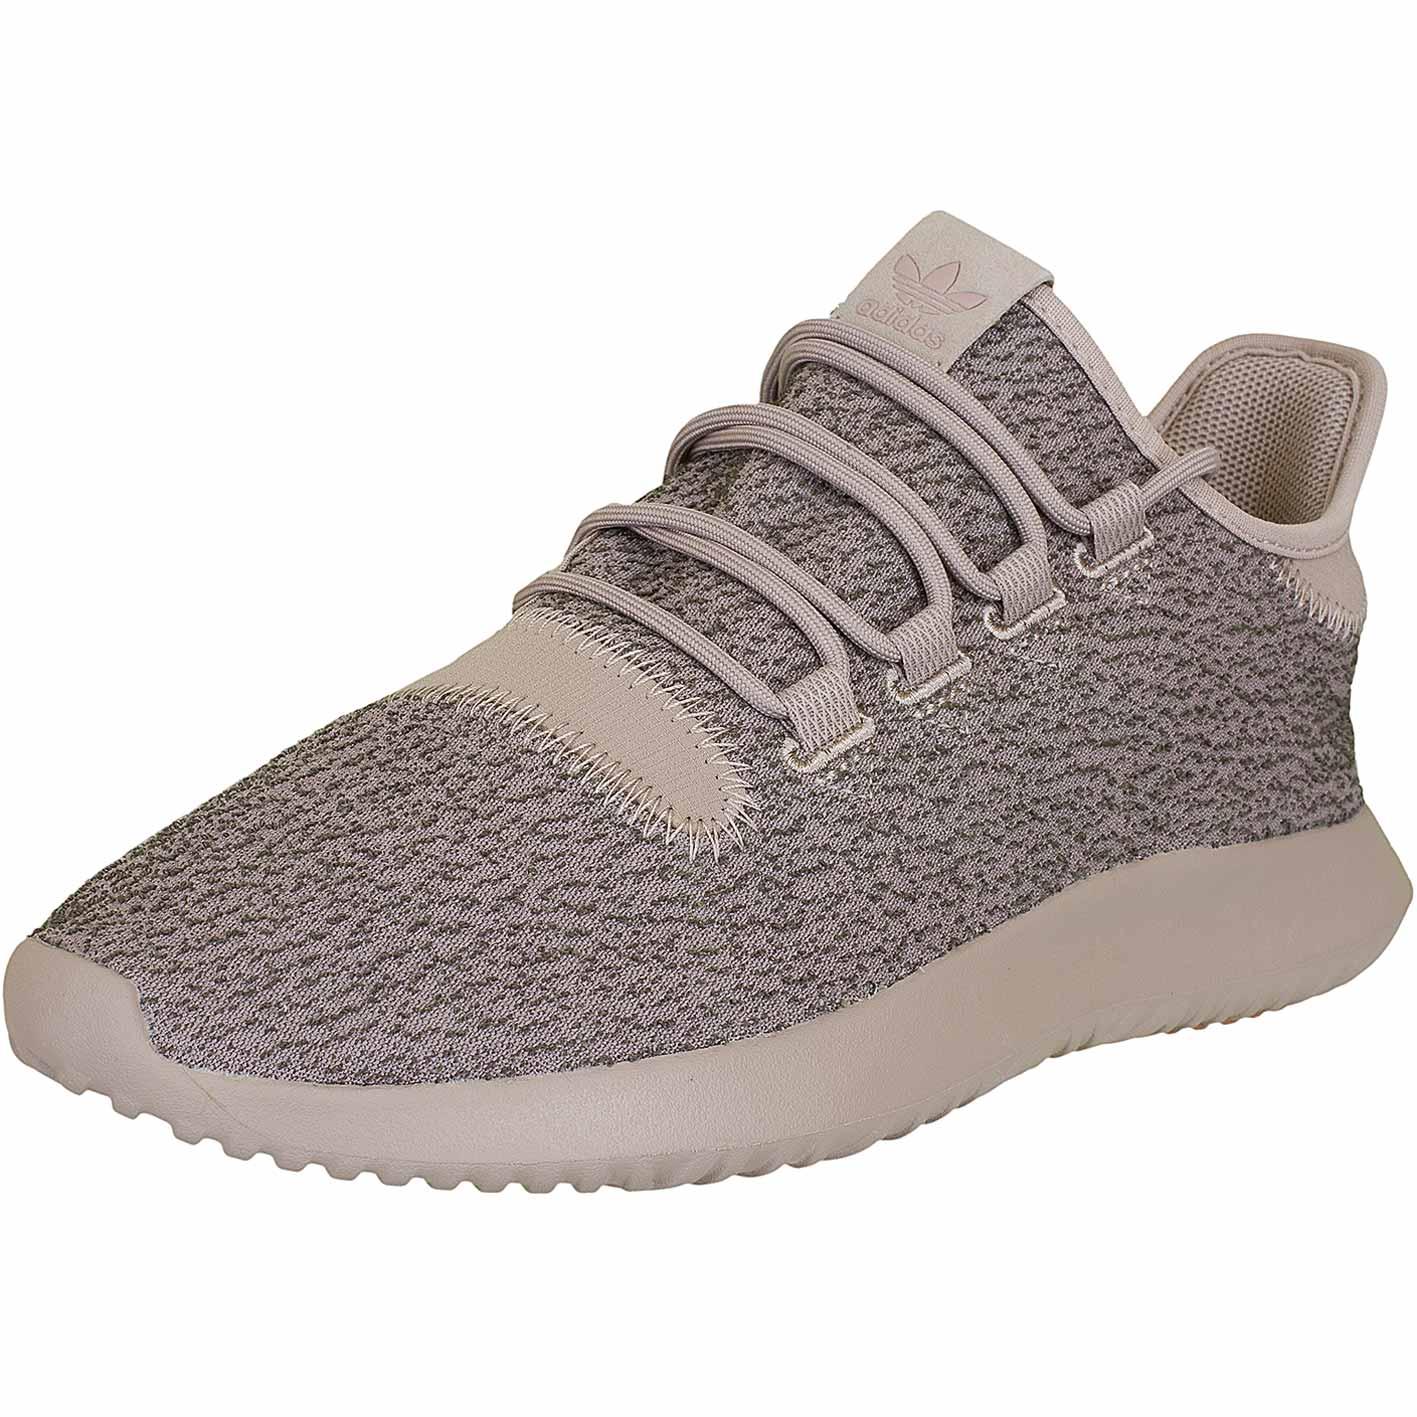 68490f655b5bd cheapest adidas tubular shadow schuhe braun 52629 4d170; discount code for adidas  originals sneaker tubular shadow braun 0926e 9f1ba